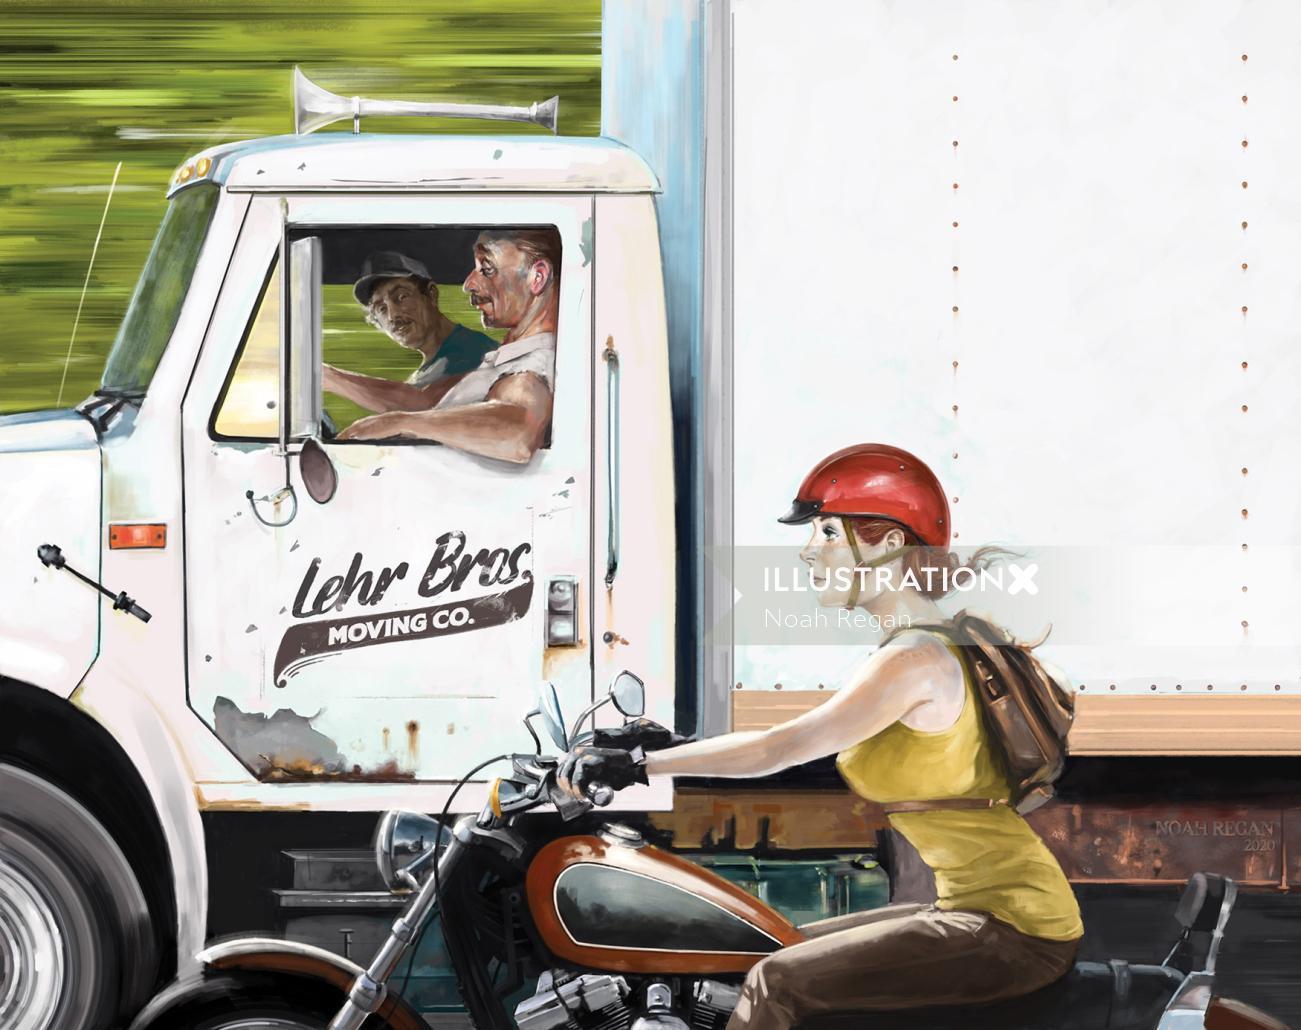 Lehr Bros. Moving Company